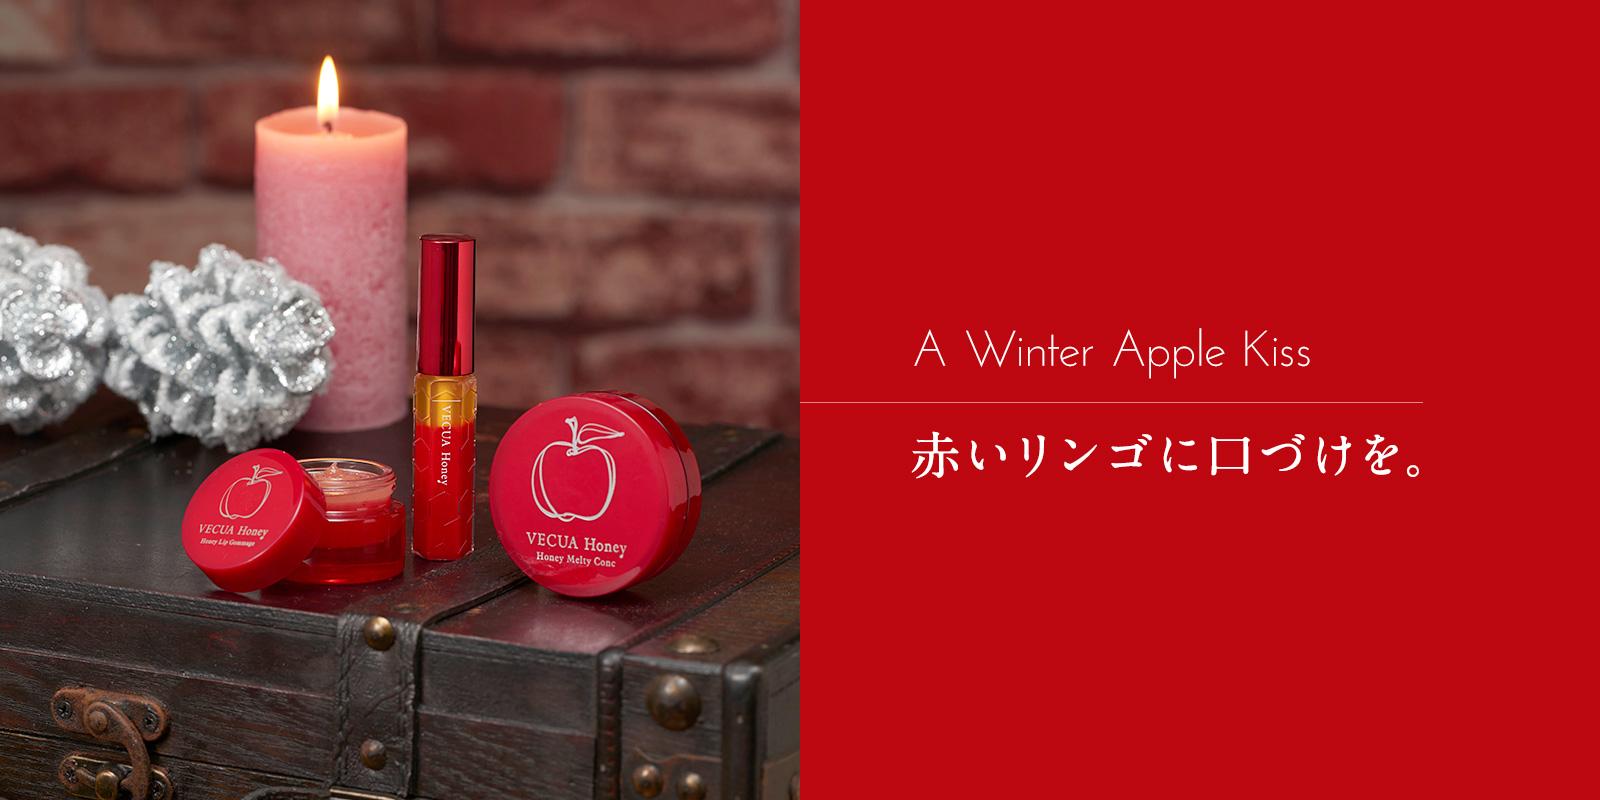 A Winter Apple Kiss 赤いリンゴに口づけを。